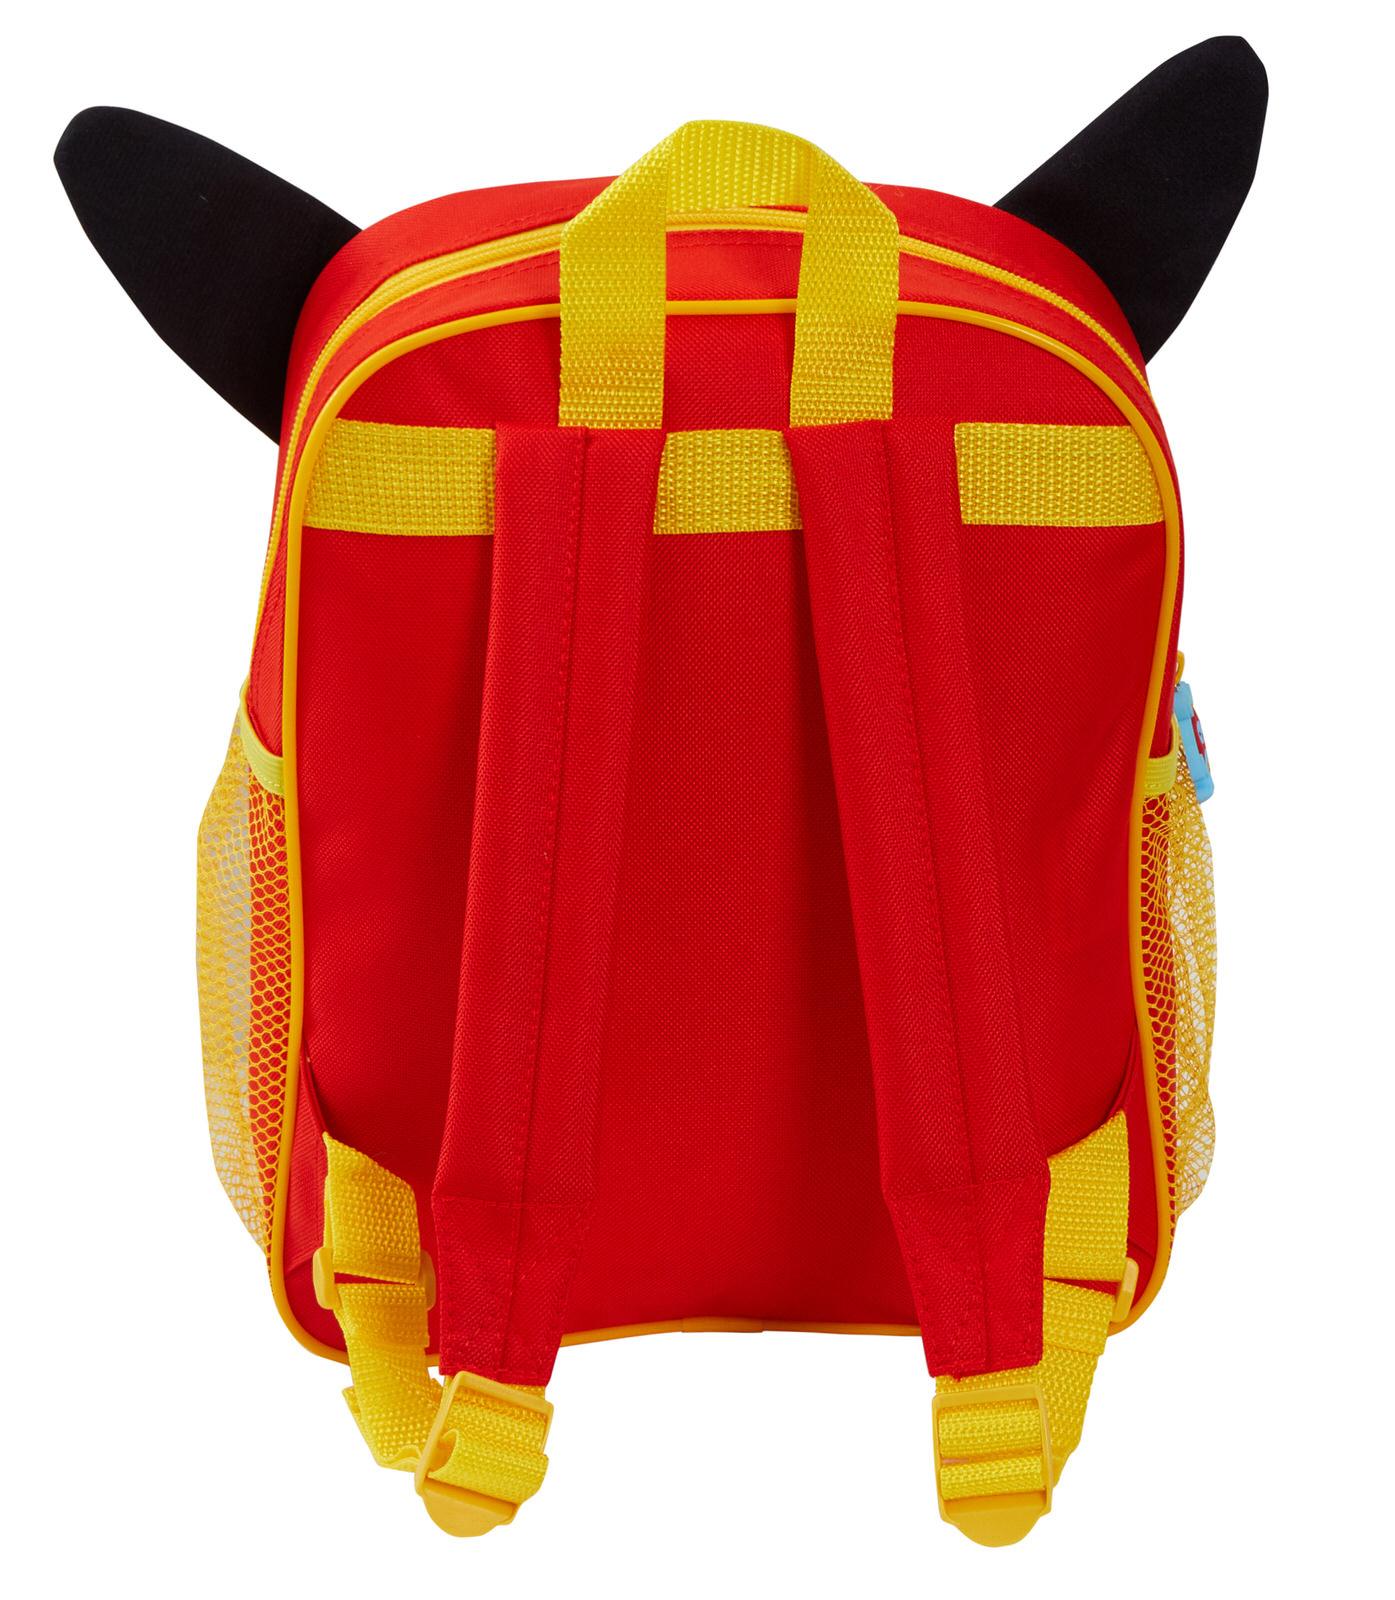 miniatuur 10 - Kids Bing Bunny 3D Plush Backpack Boys Girls Nursery School Rucksack Lunch Bag